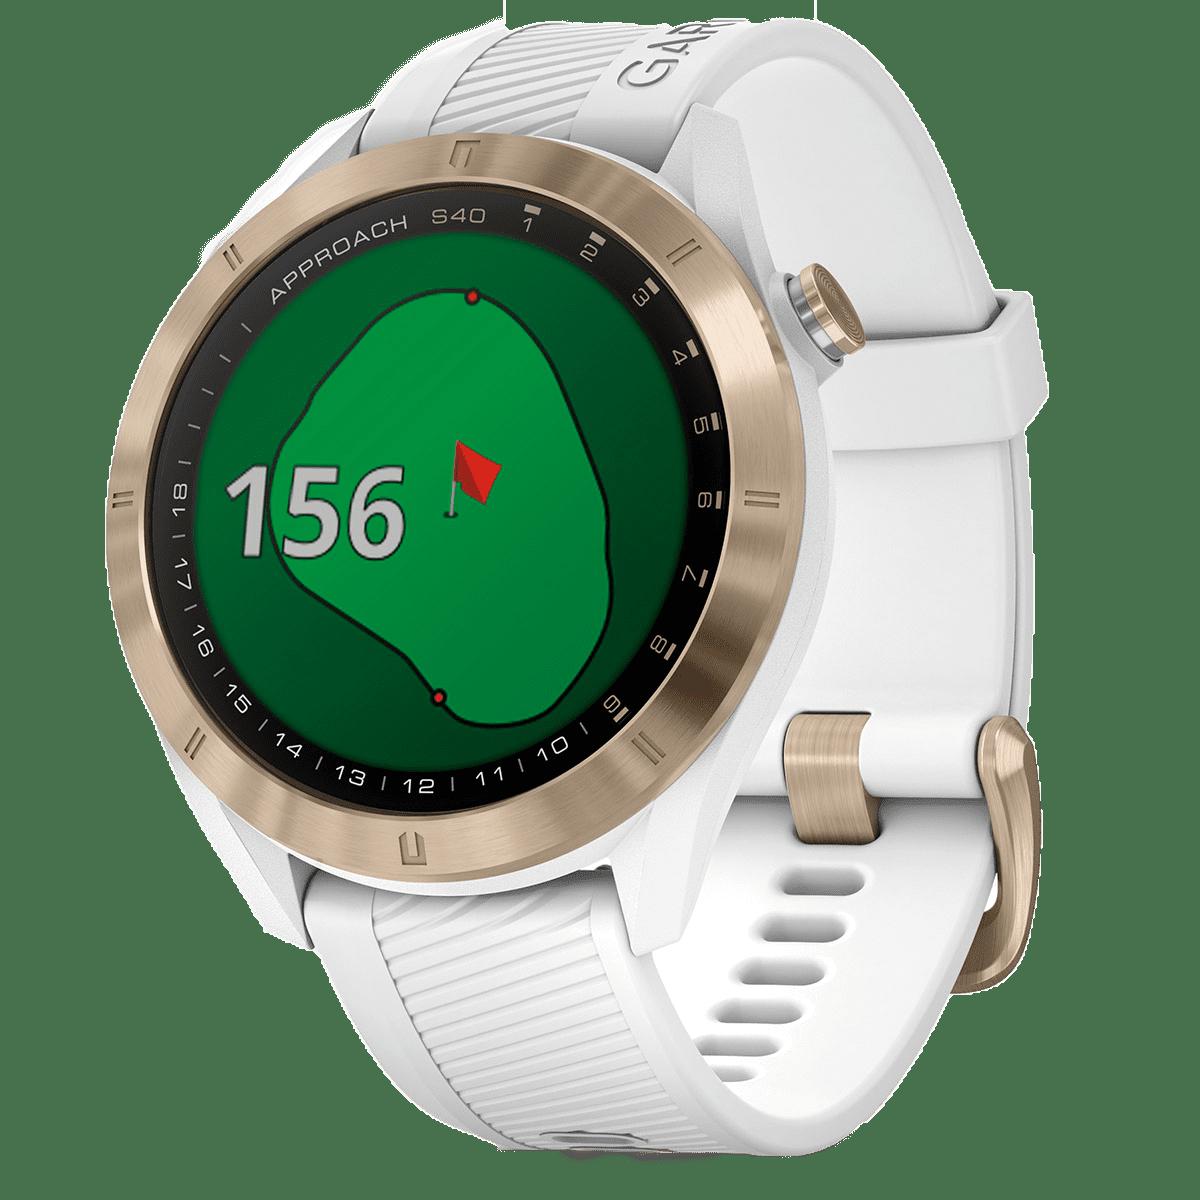 346652-White-Garmin-Approach-S40-Premium-GPS-Watch-9a copia copia